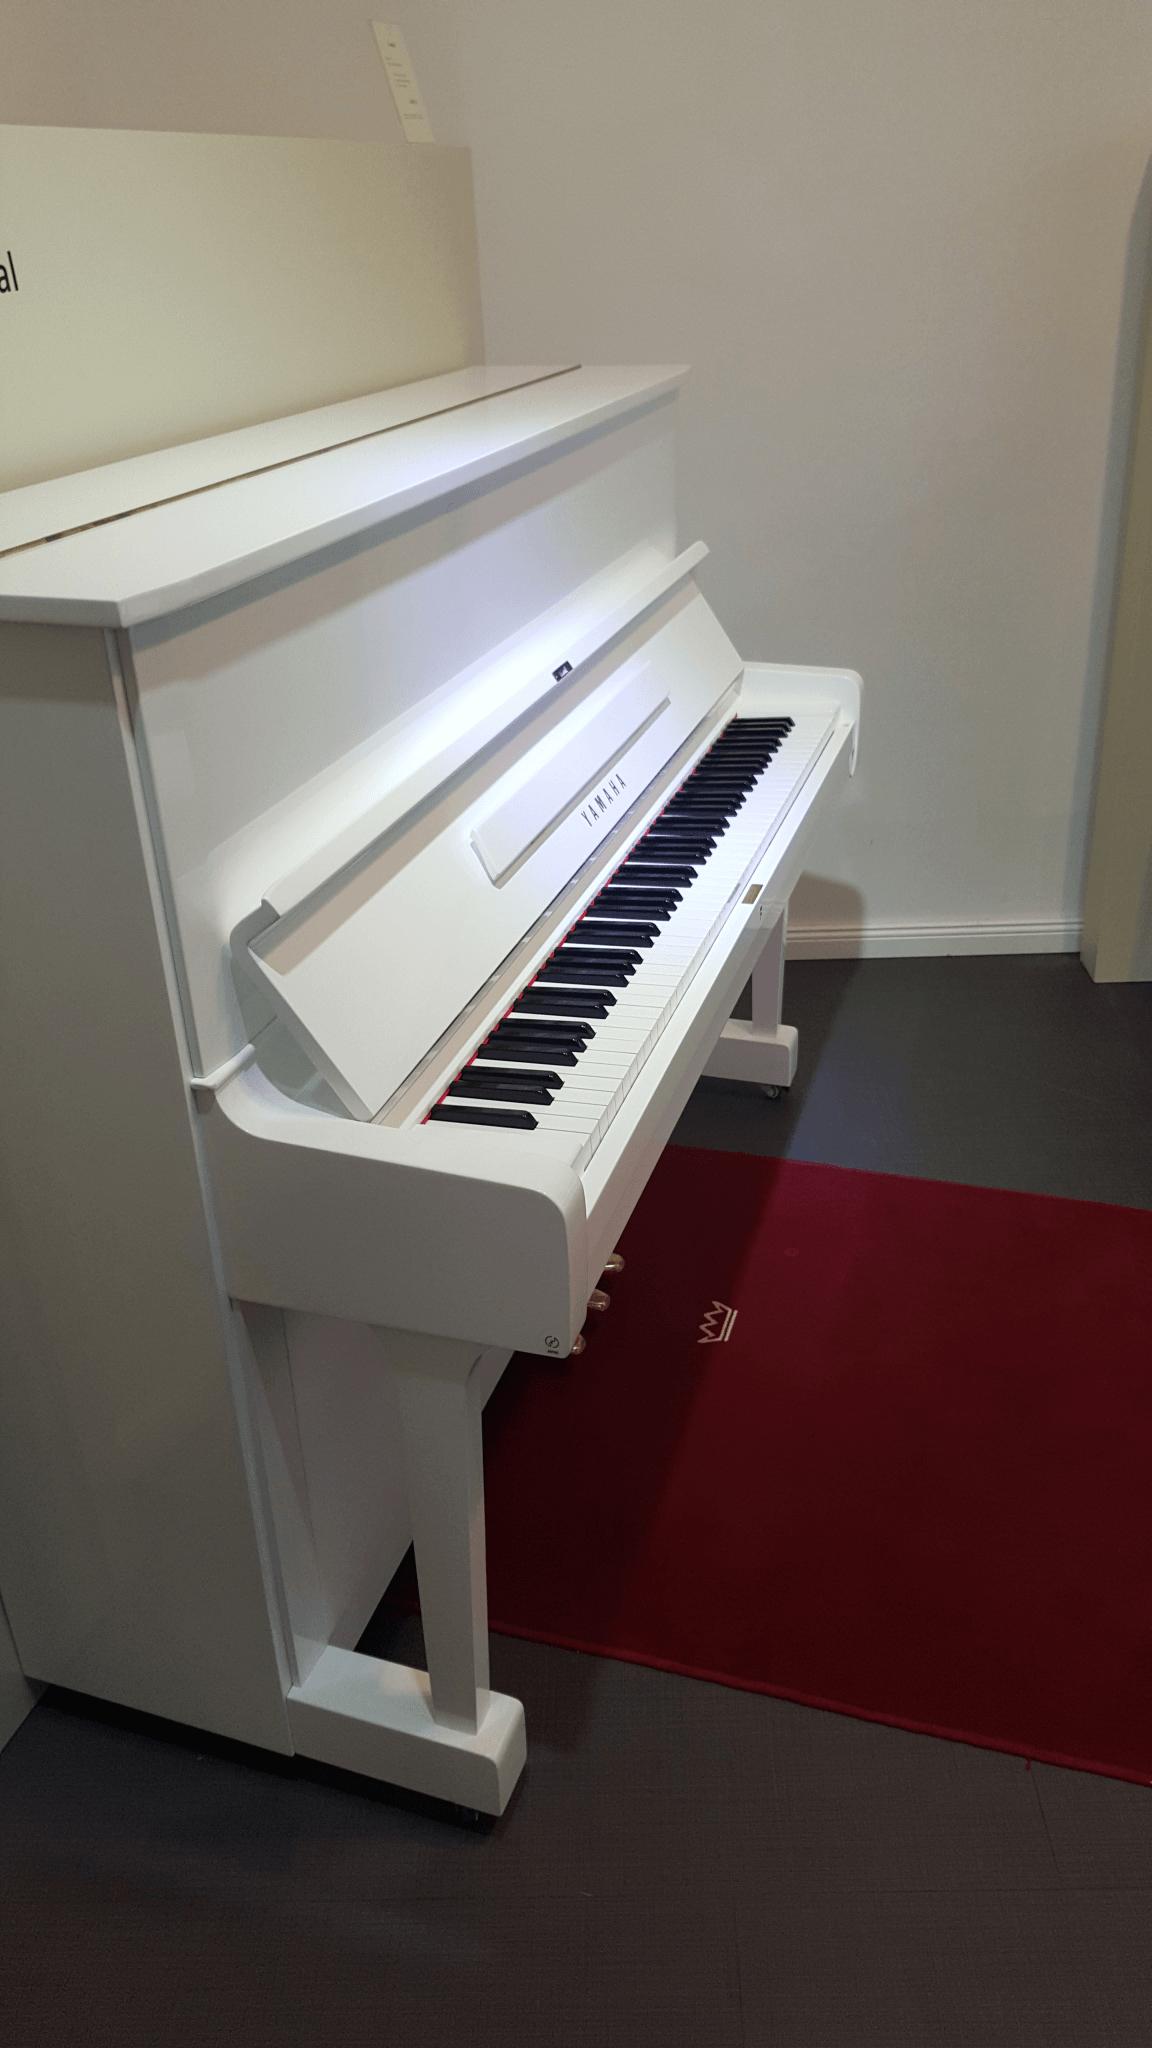 yamaha klaviere berlin pianohaus listmann. Black Bedroom Furniture Sets. Home Design Ideas